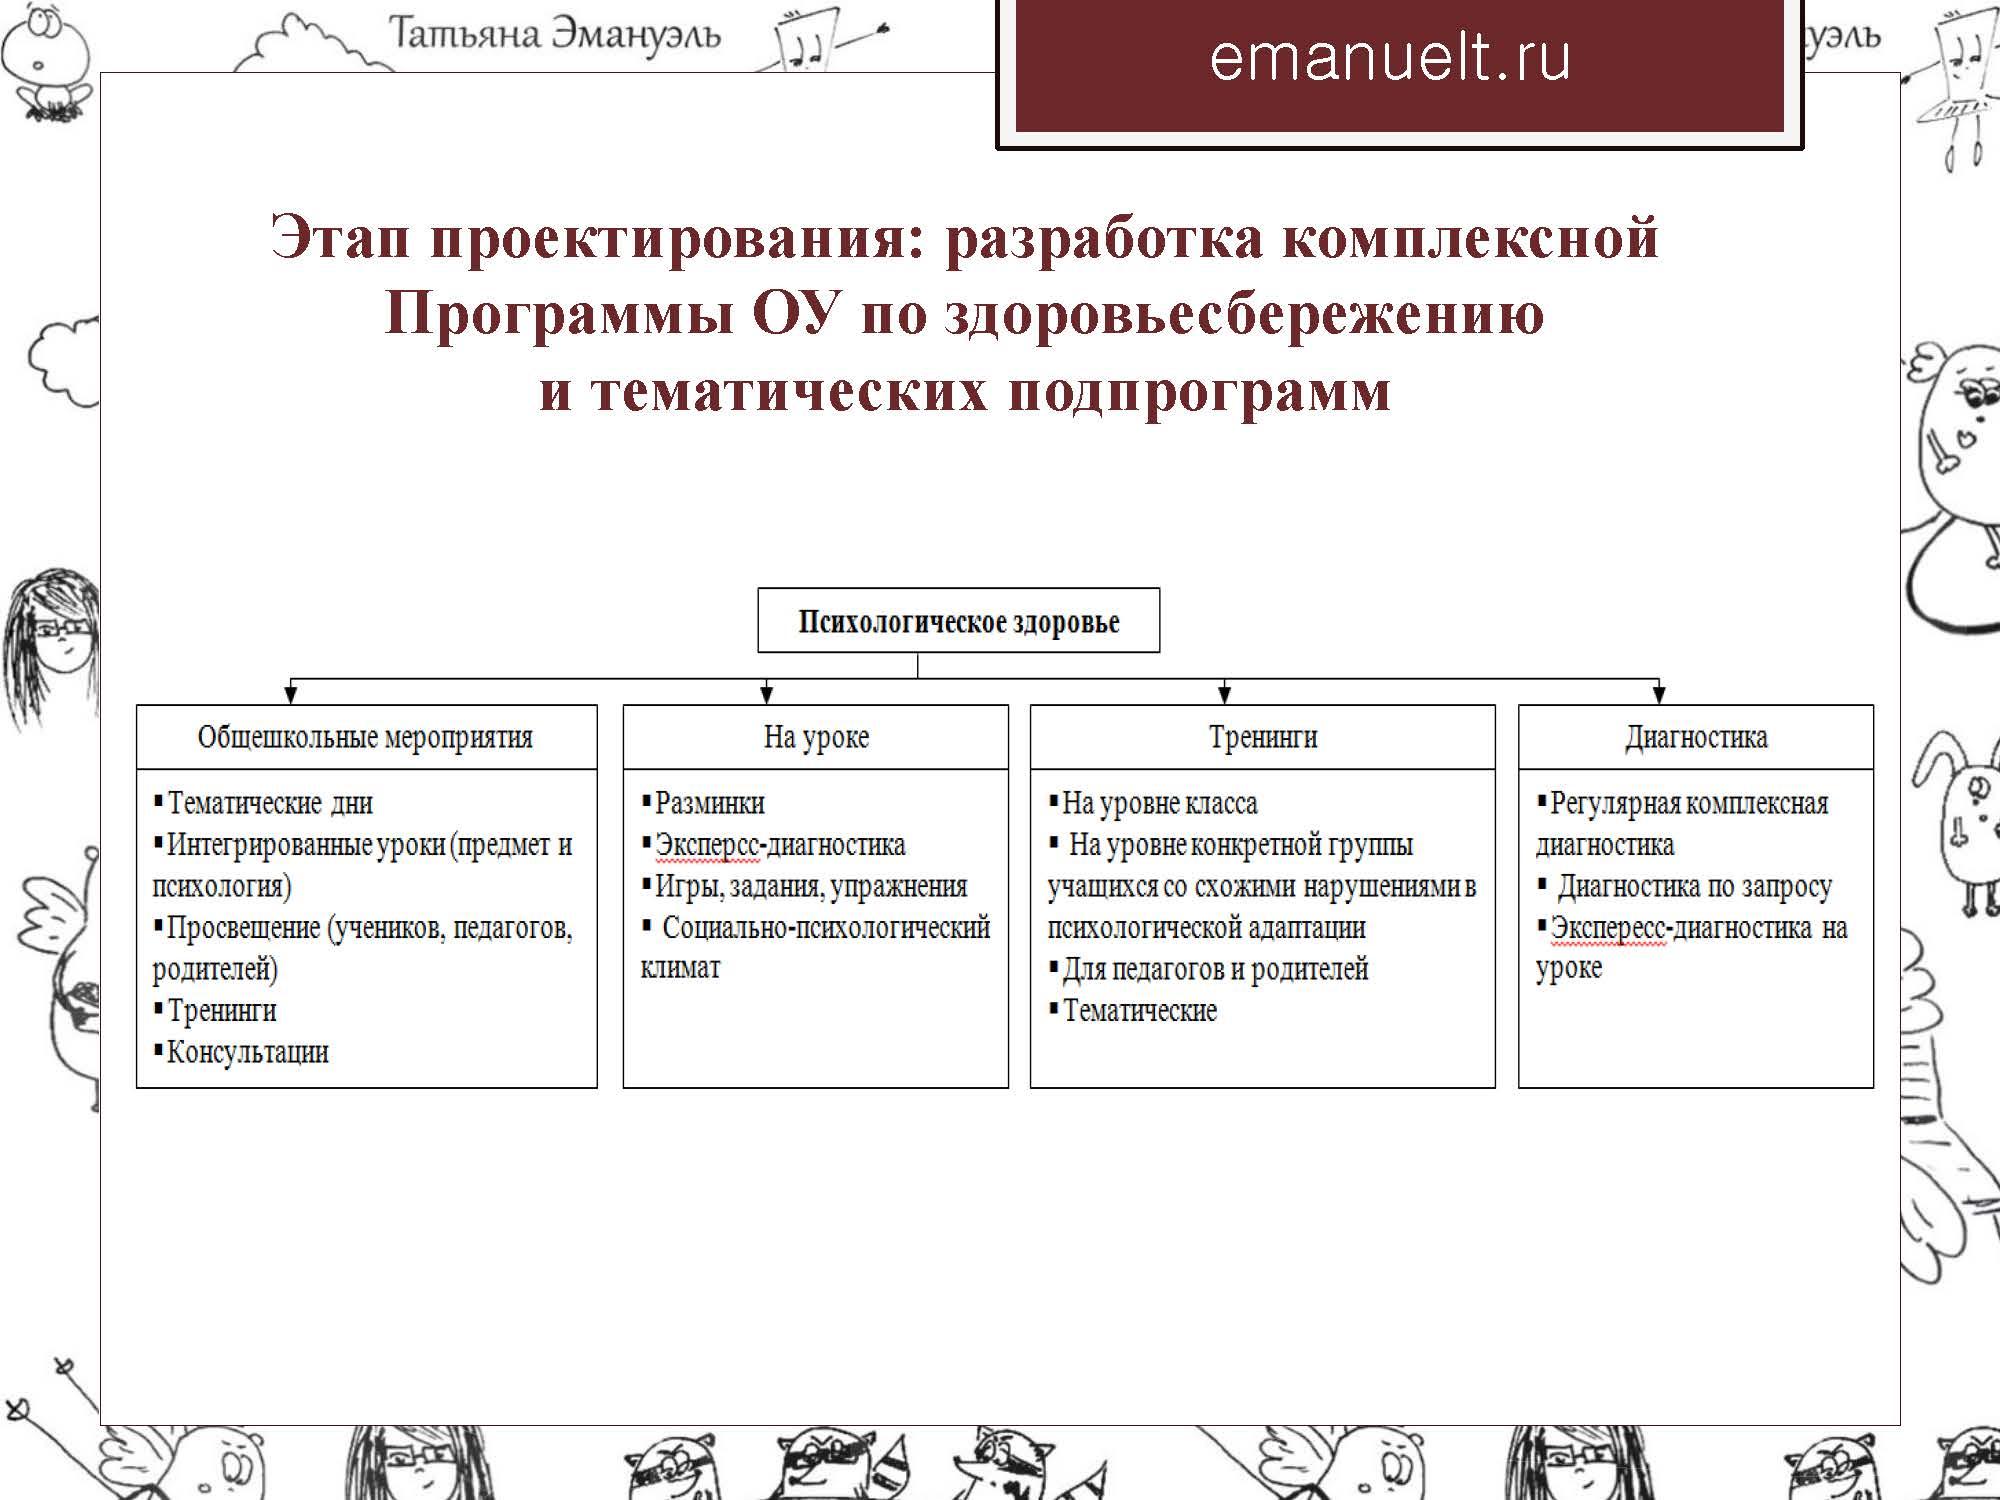 06 февраля эмануэль_Страница_077